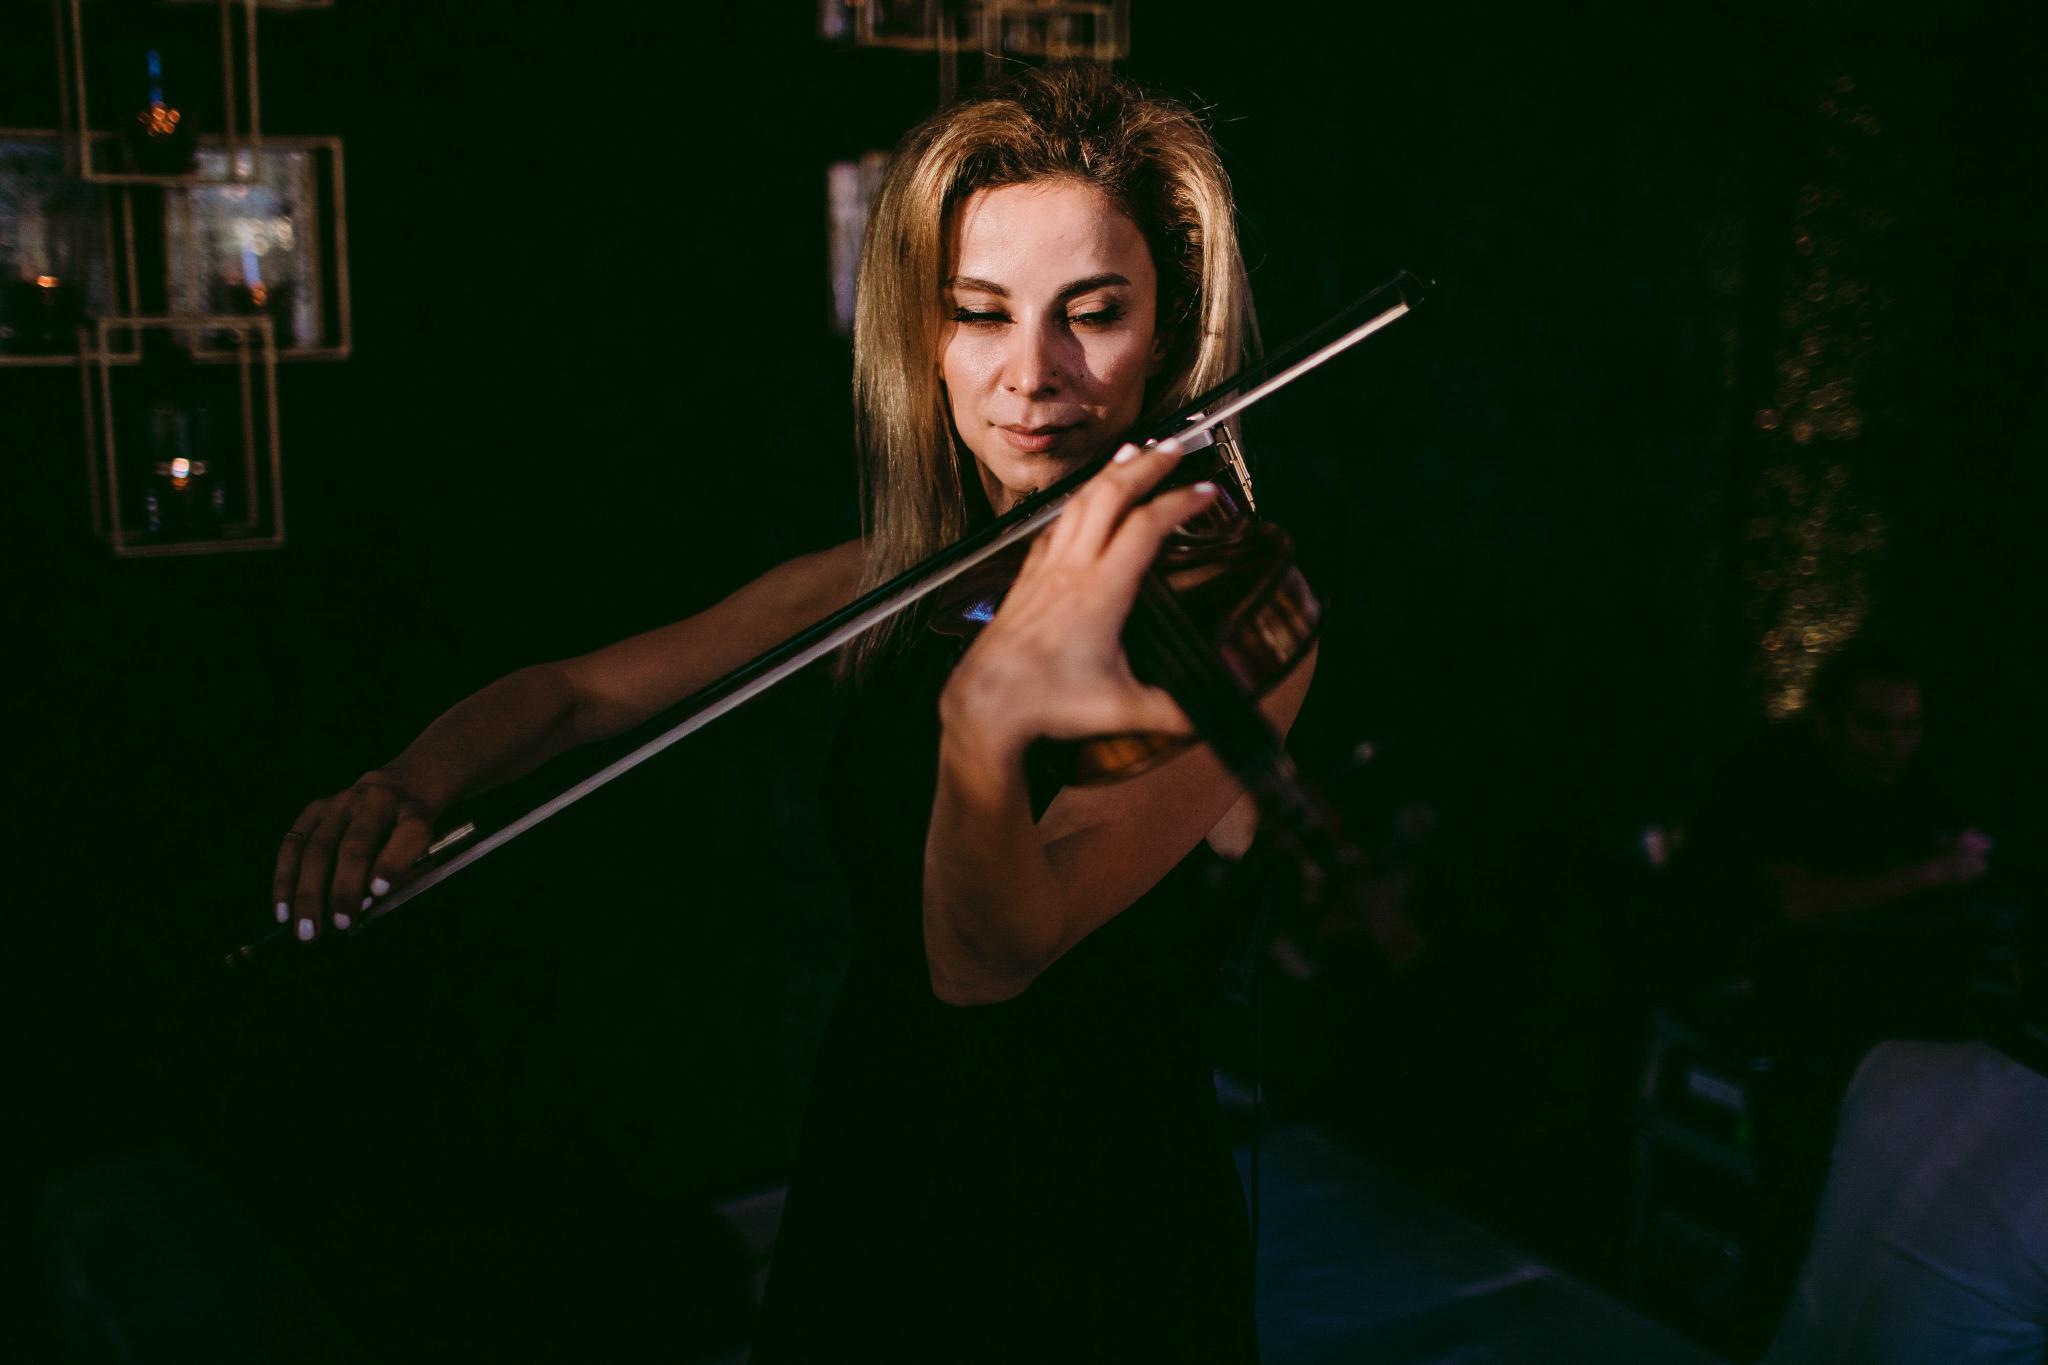 san diego wedding   photographer | violinist in black dress